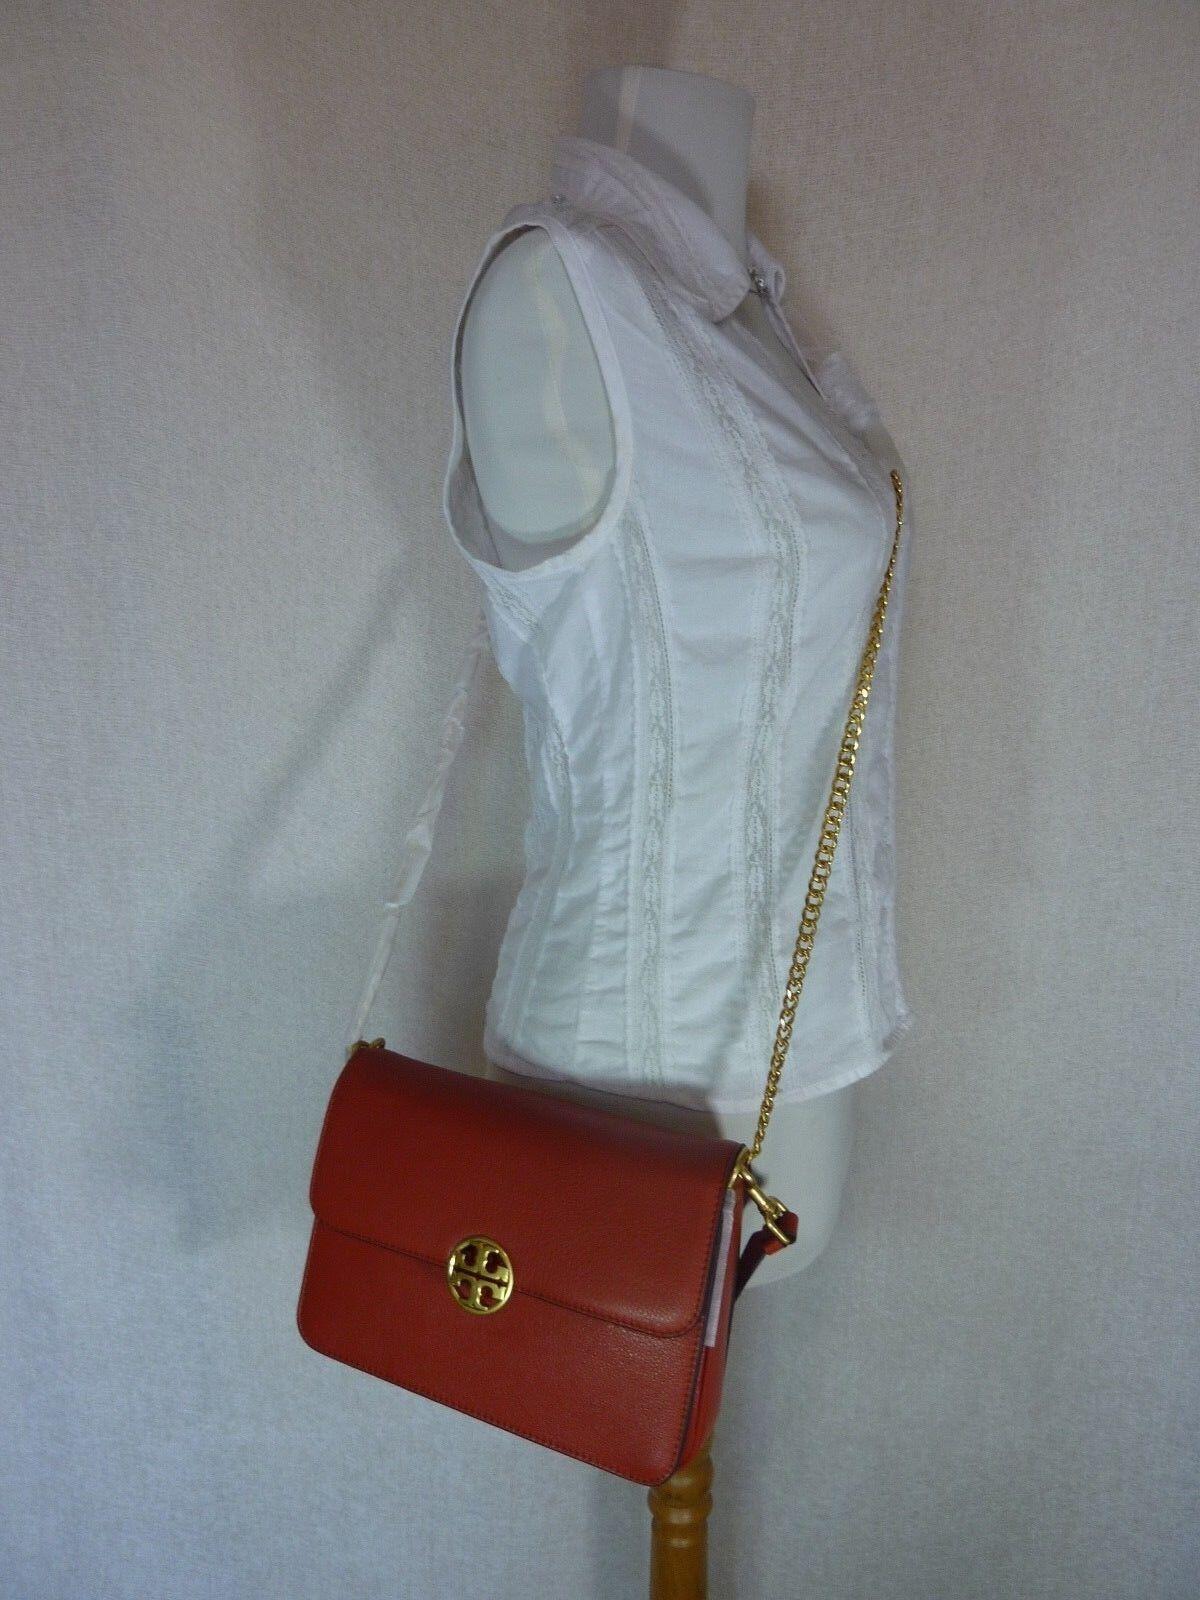 aa618335c7cc Tory Burch Chelsea Convertible Shoulder Bag Kola 48735 for sale ...